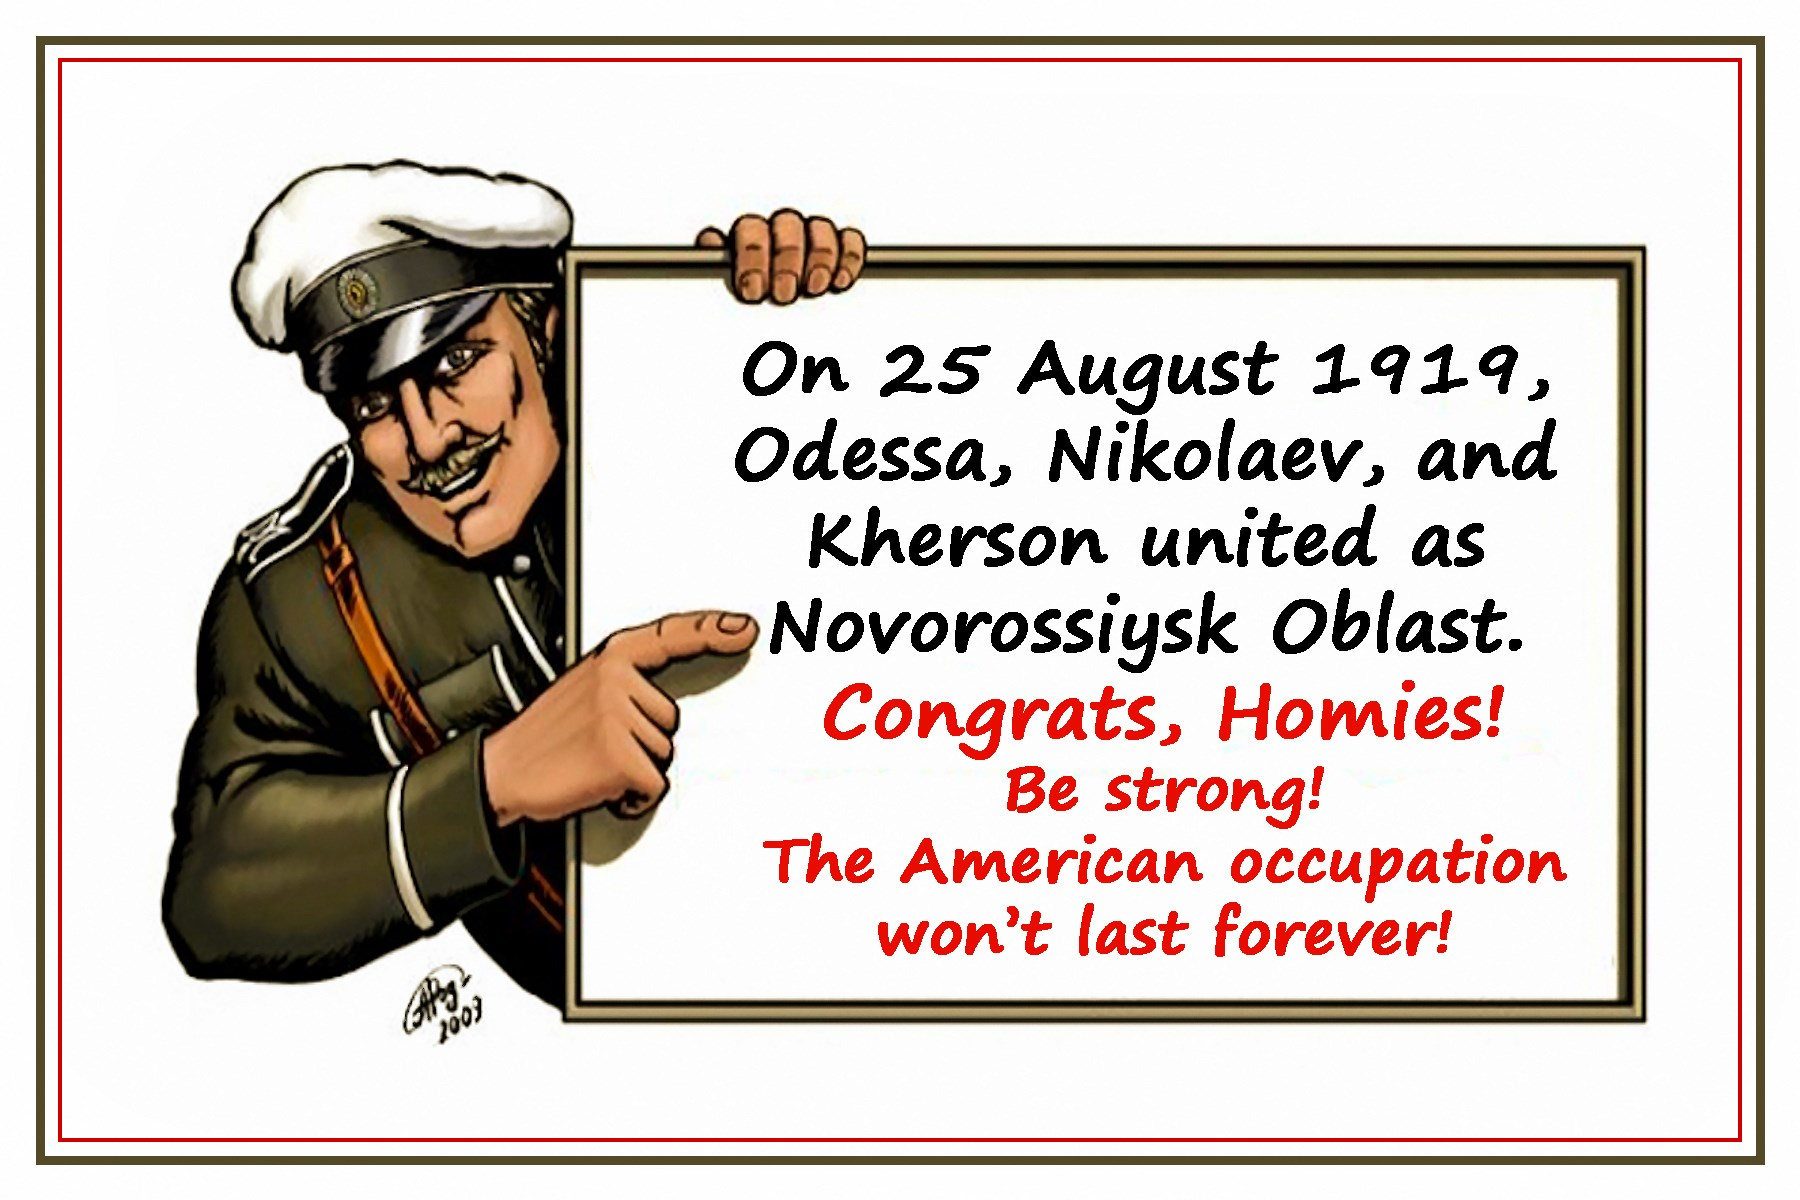 00 Odessa anniversary 270815